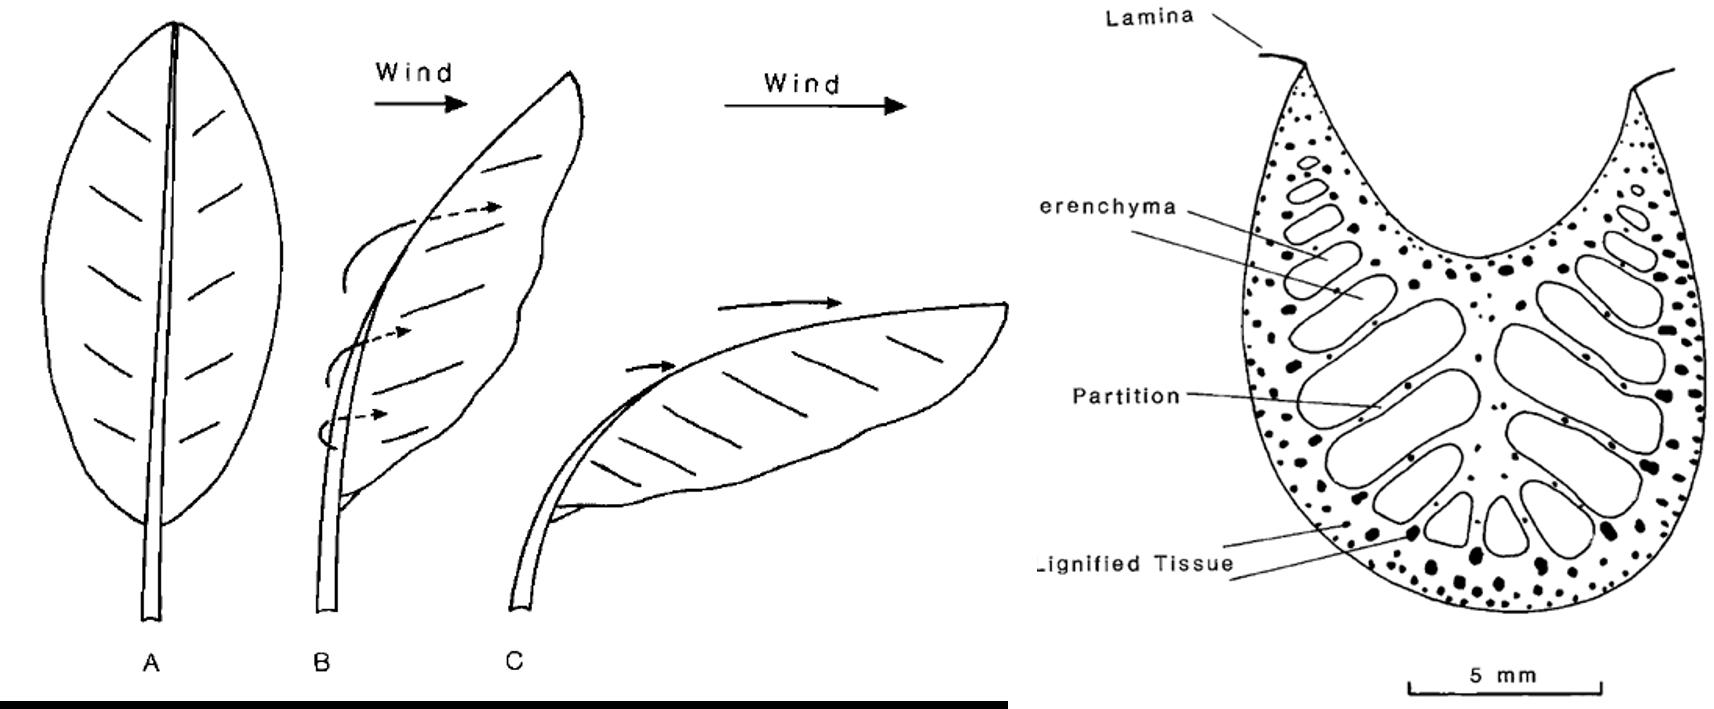 Figure 1: Deflection of bana petiole. Figure 2: Banana petiole crosssection